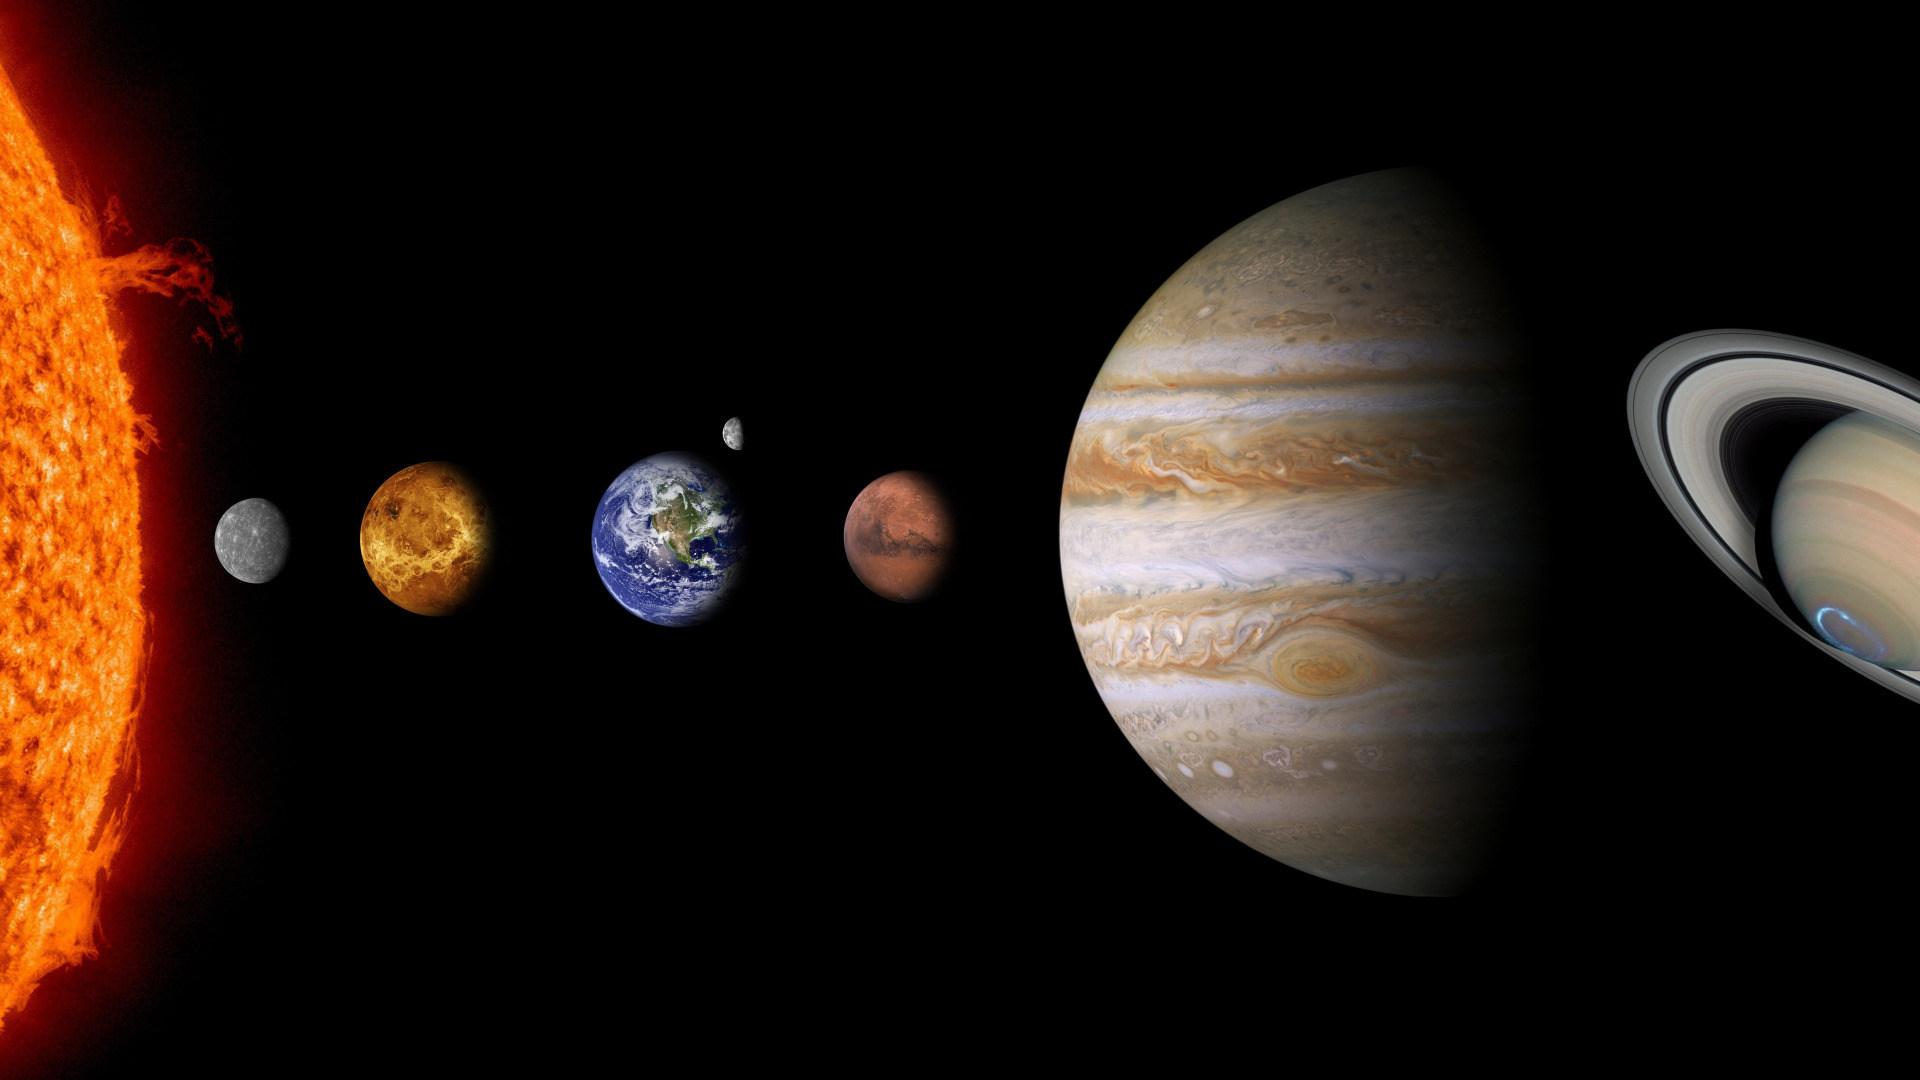 Saturn, Mars, Erde, Sonnensystem, Planeten, Venus, Jupiter, Merkur